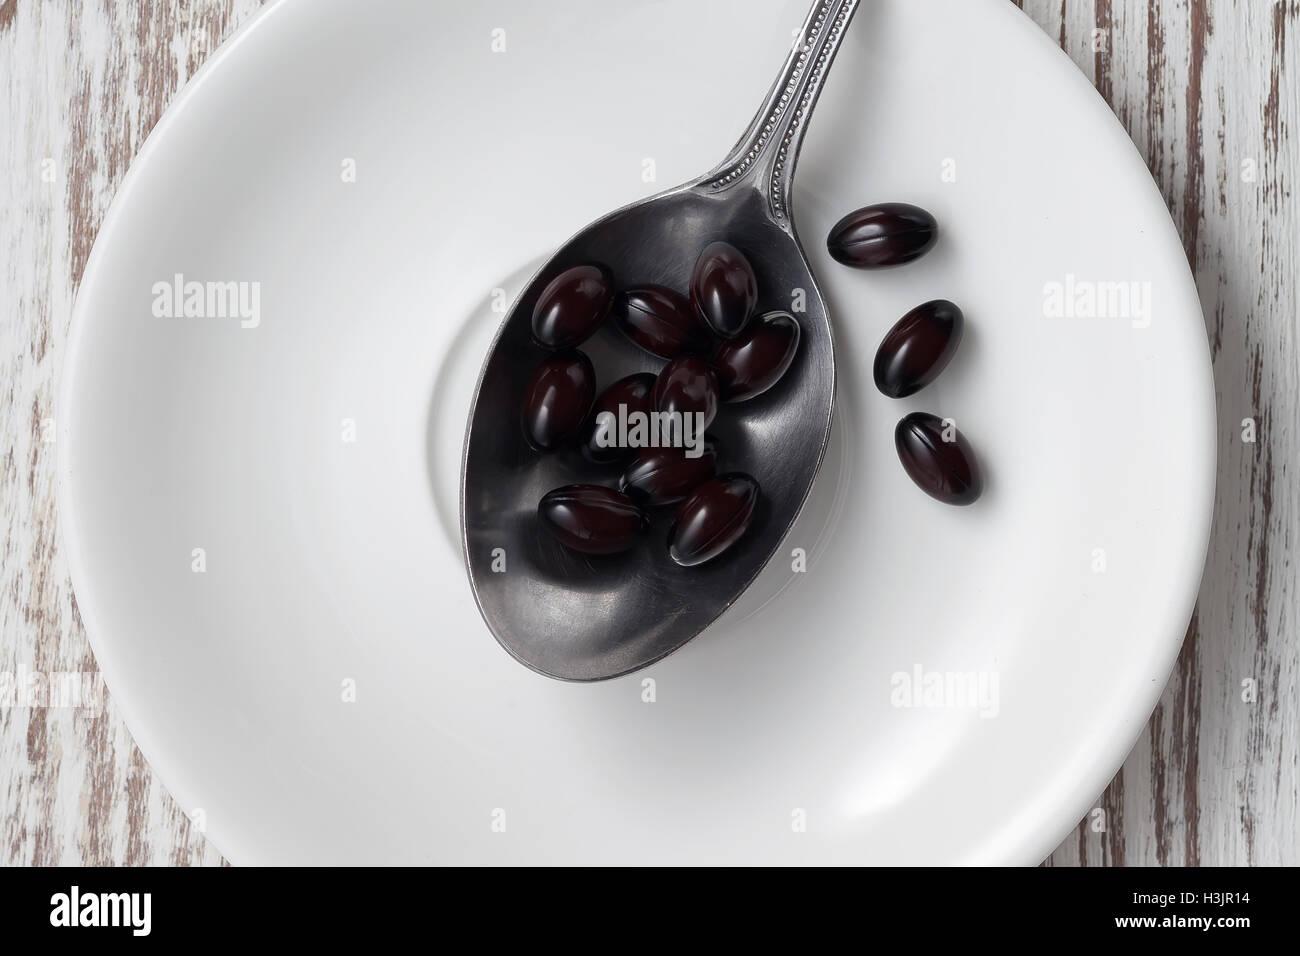 L'astaxanthine antioxydant supplément vie encore saine alternative fond blanc Photo Stock